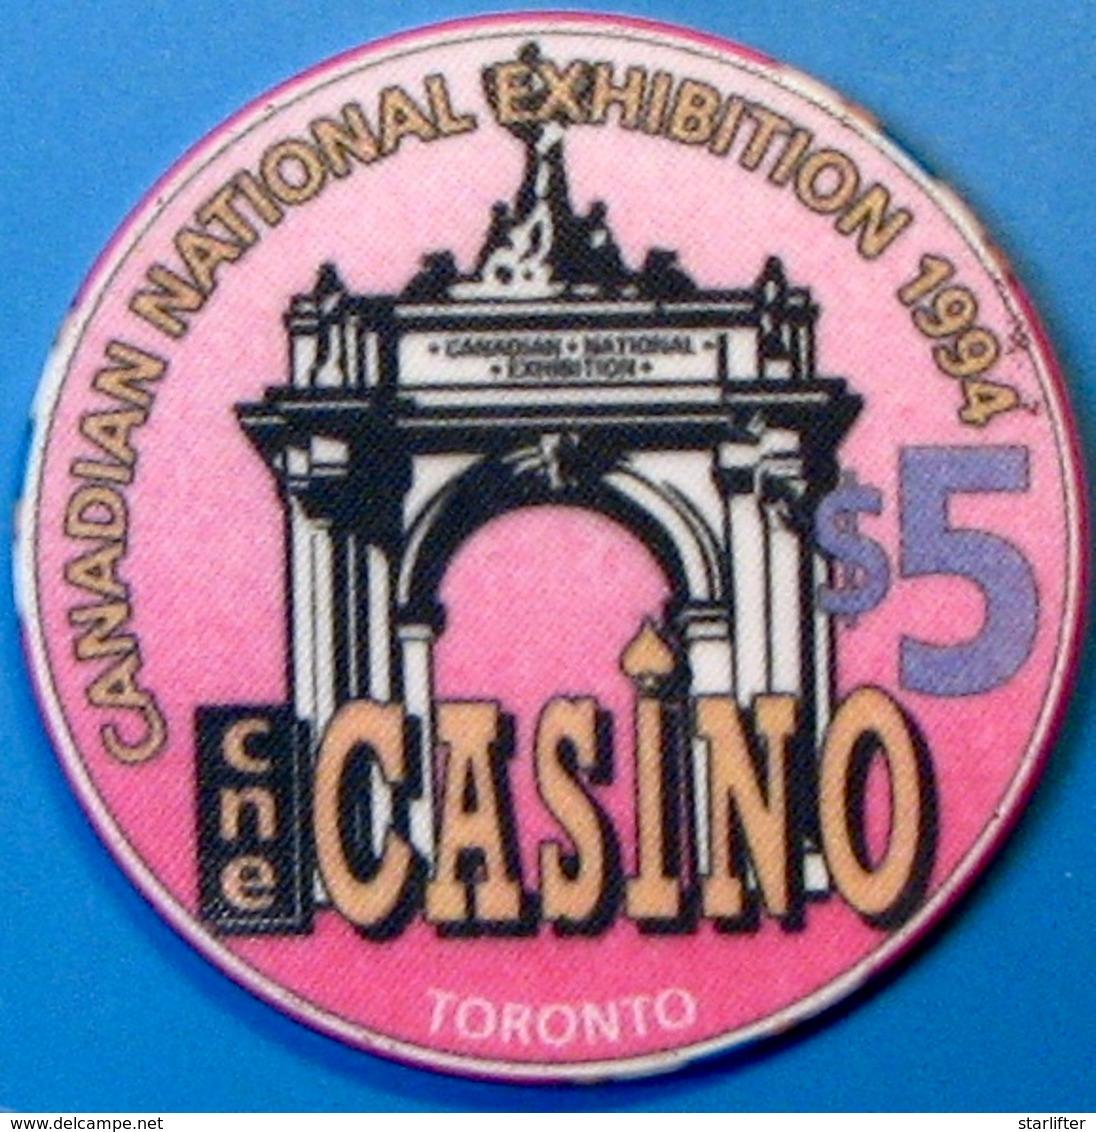 $5 Casino Chip. CNE Casino, Ontario, Canada. M79. - Casino